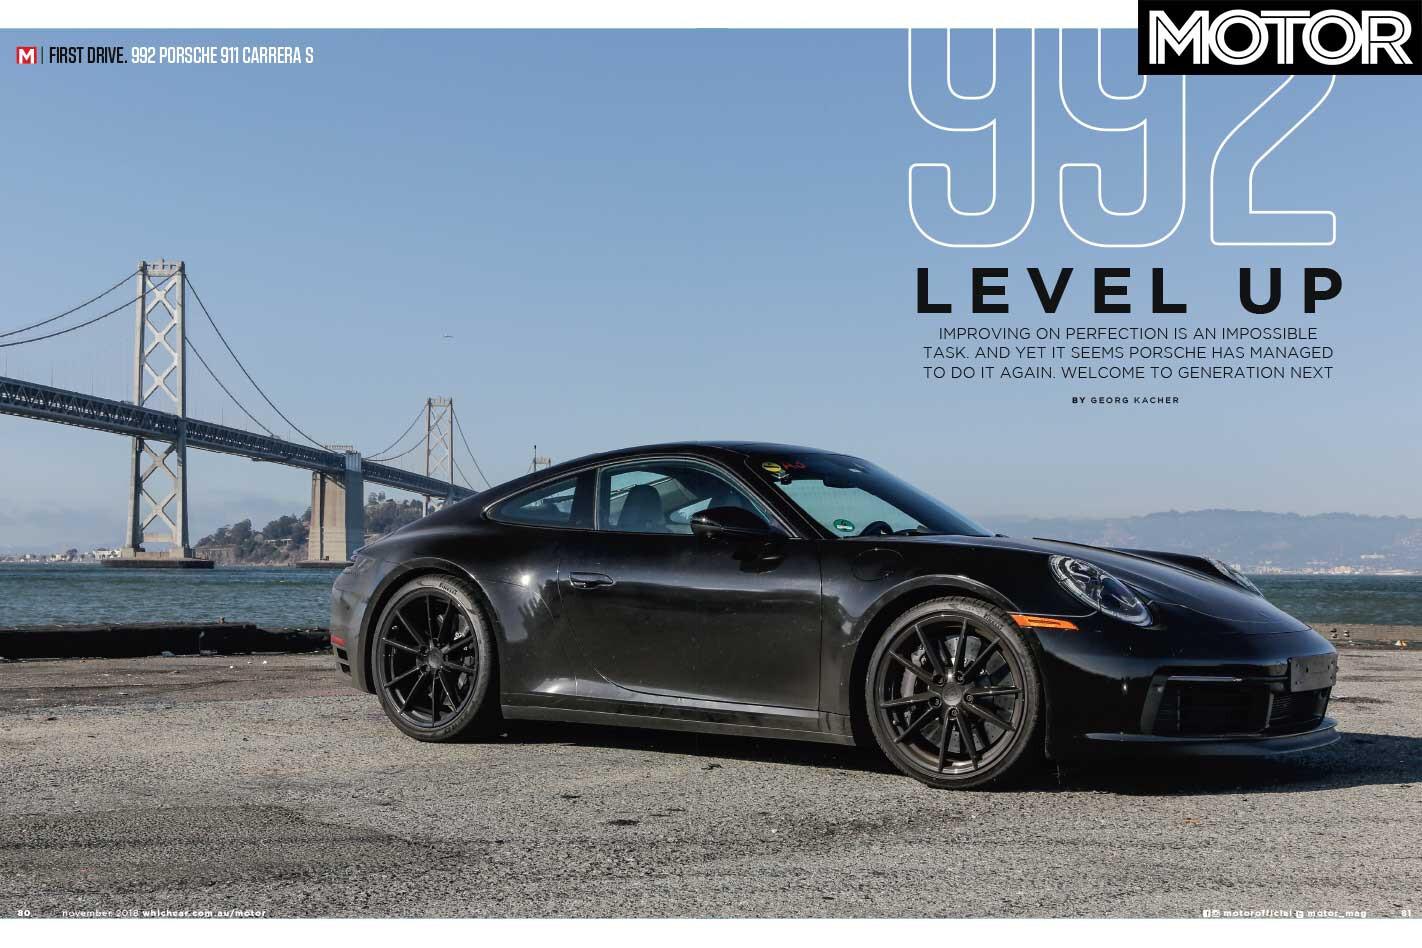 MOTOR Magazine November 2018 Porsche 992 911 Jpg